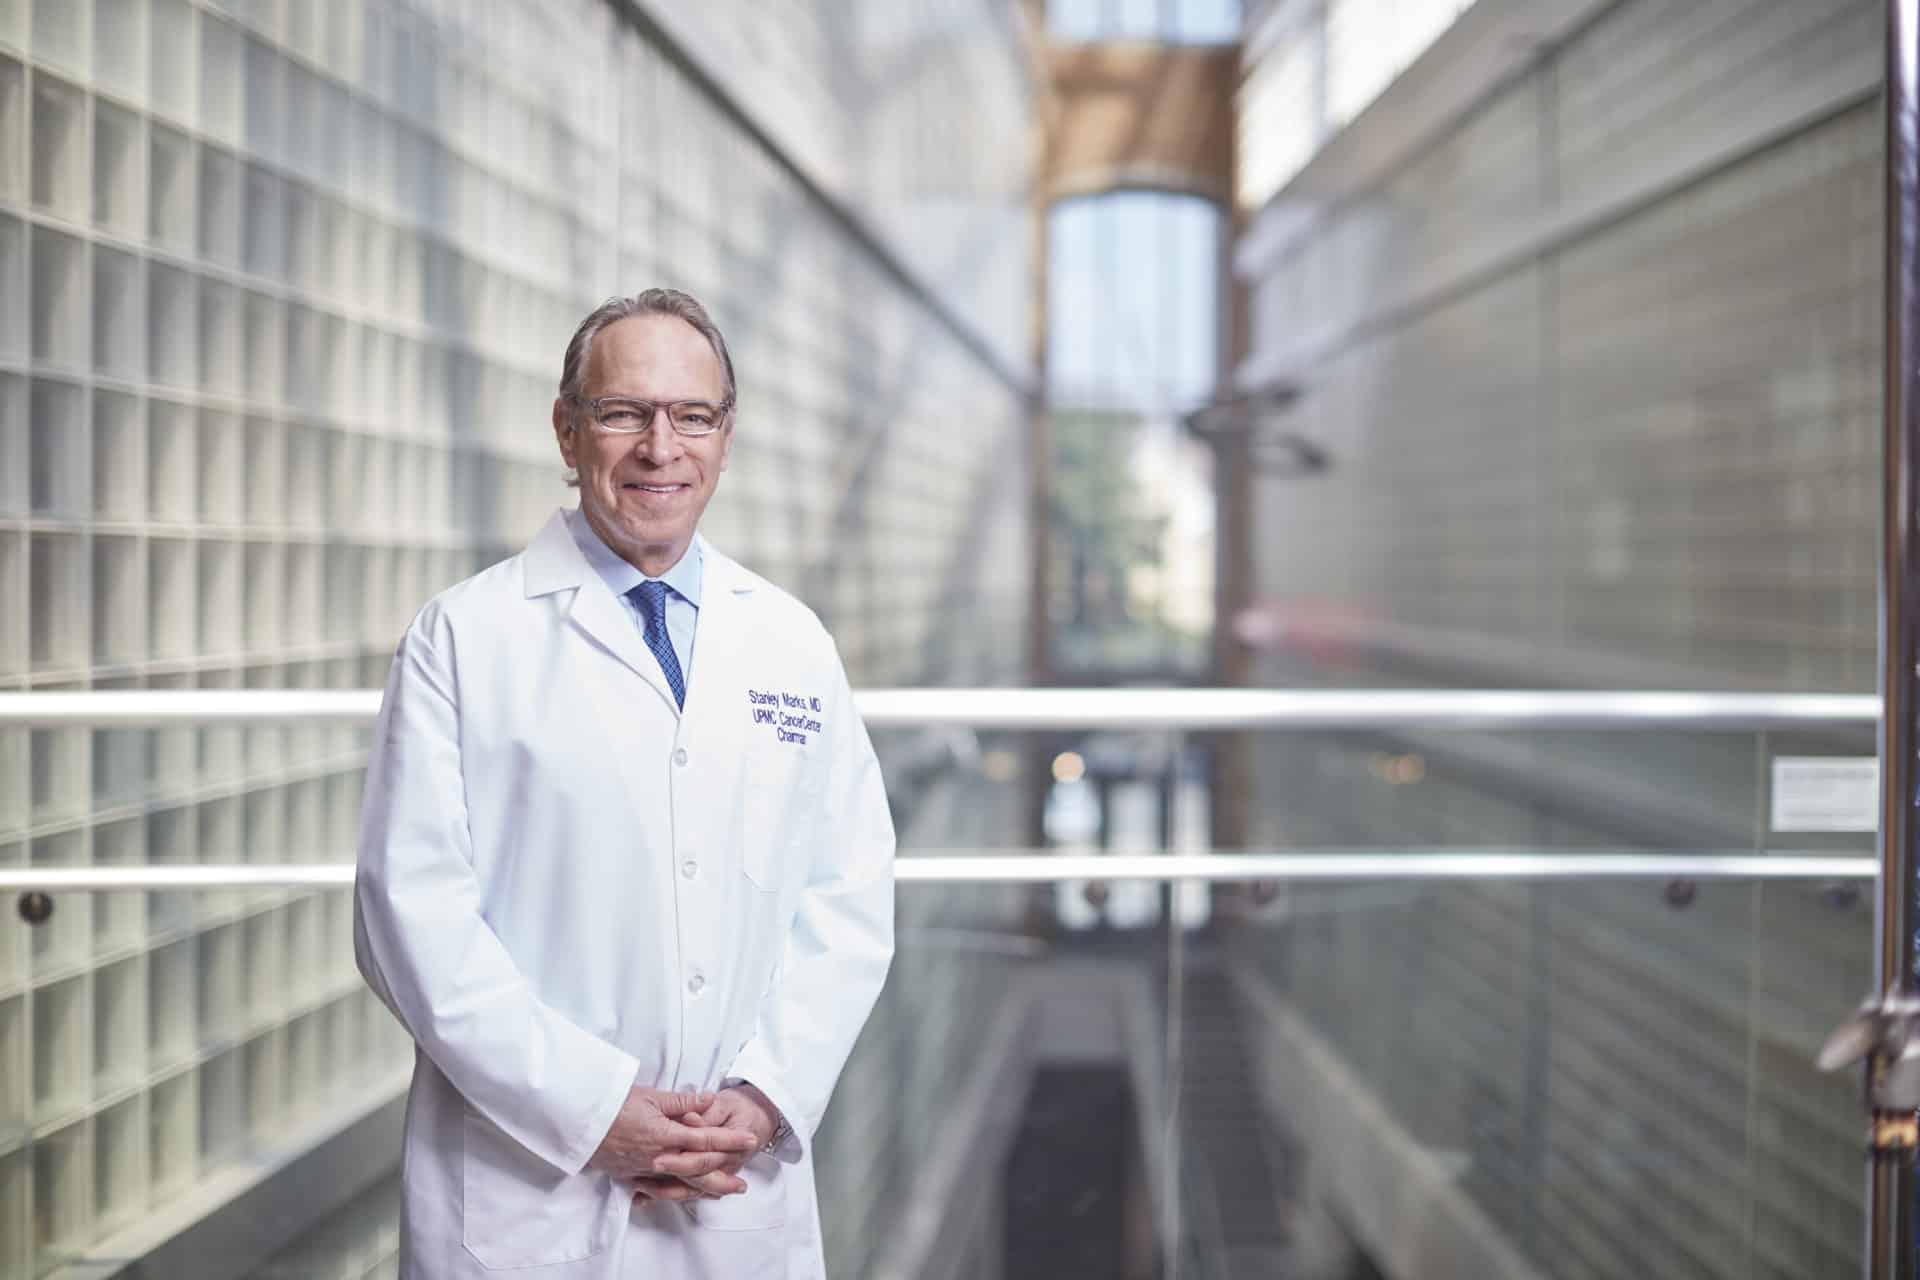 Dr. Stanley Marks